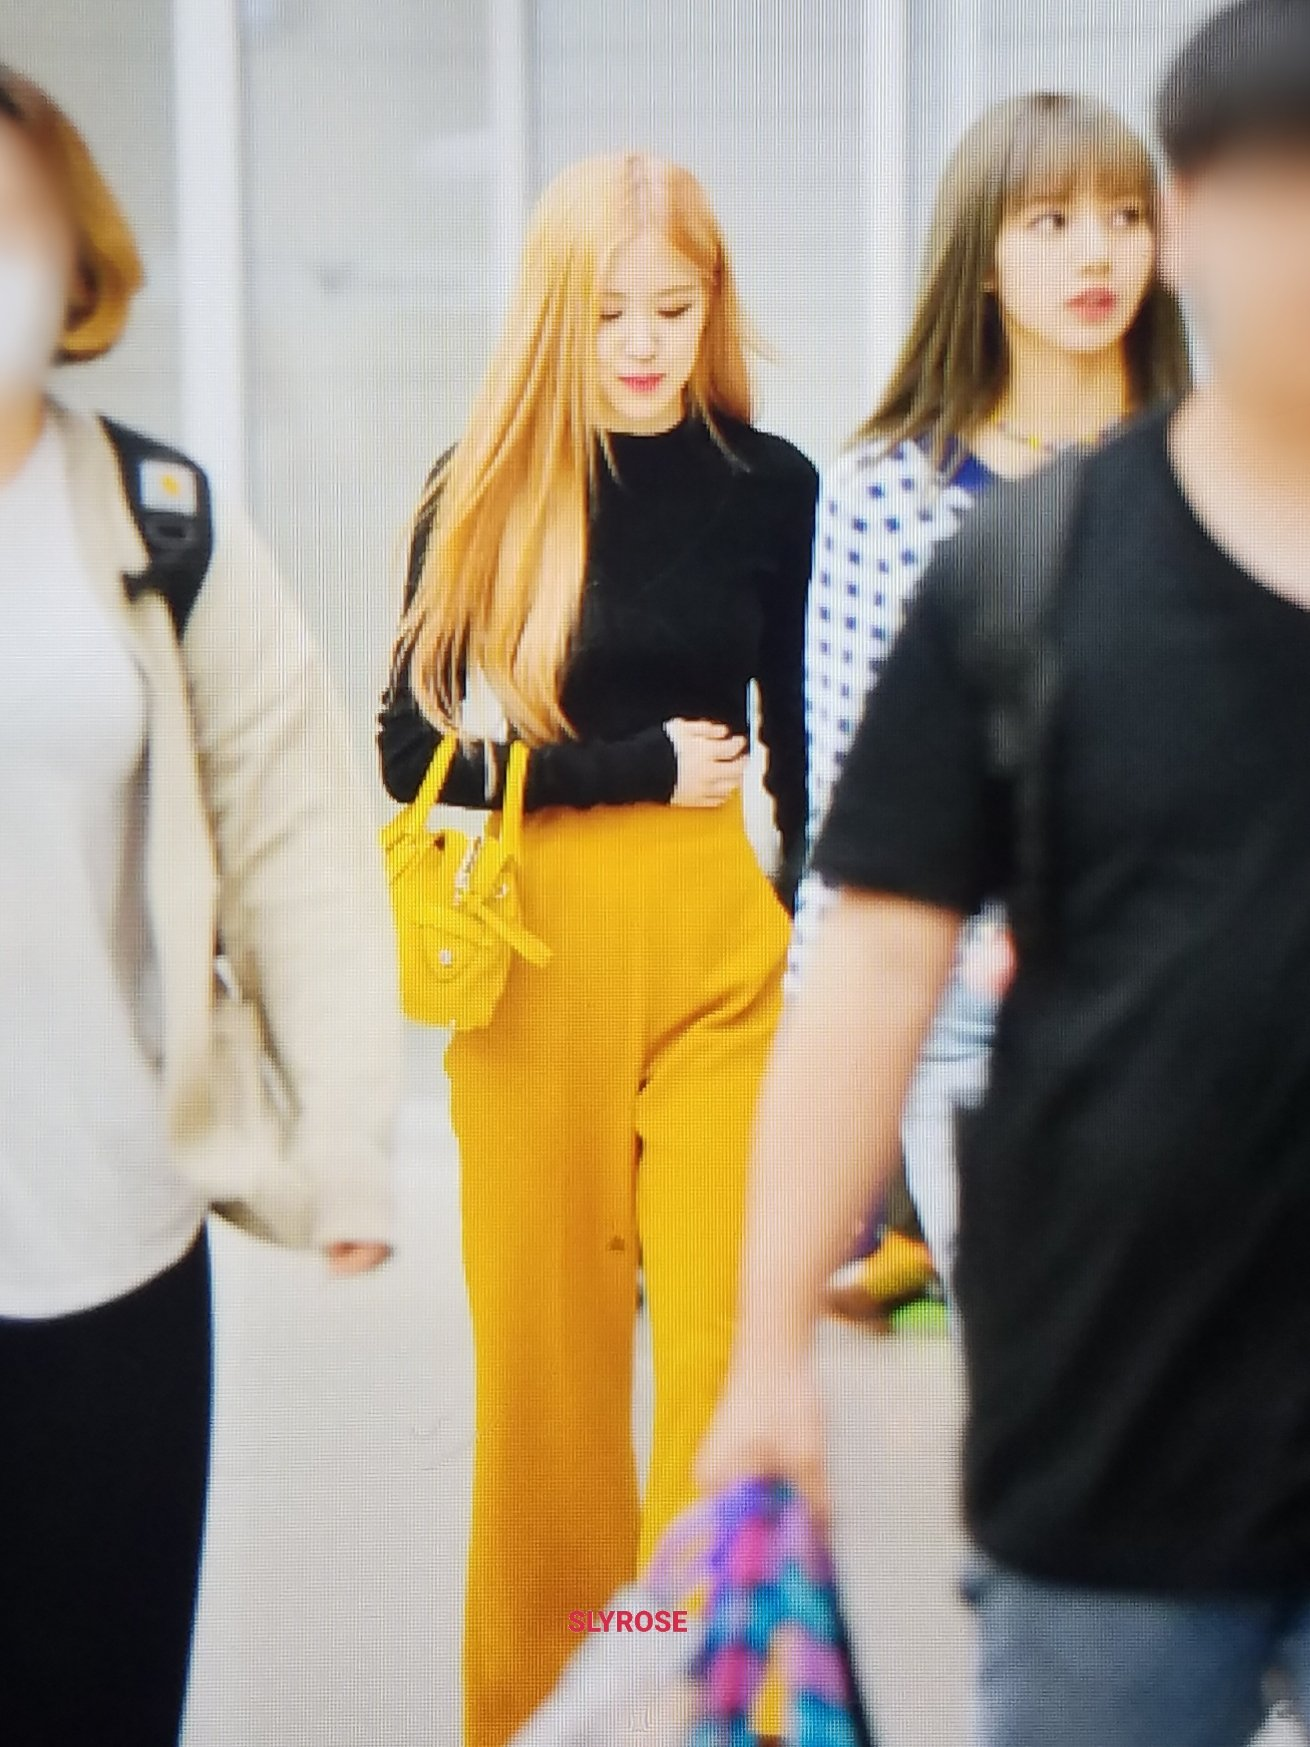 24 Blackpink Rose Airport Photos Incheon From Bangkok 11 April 2019